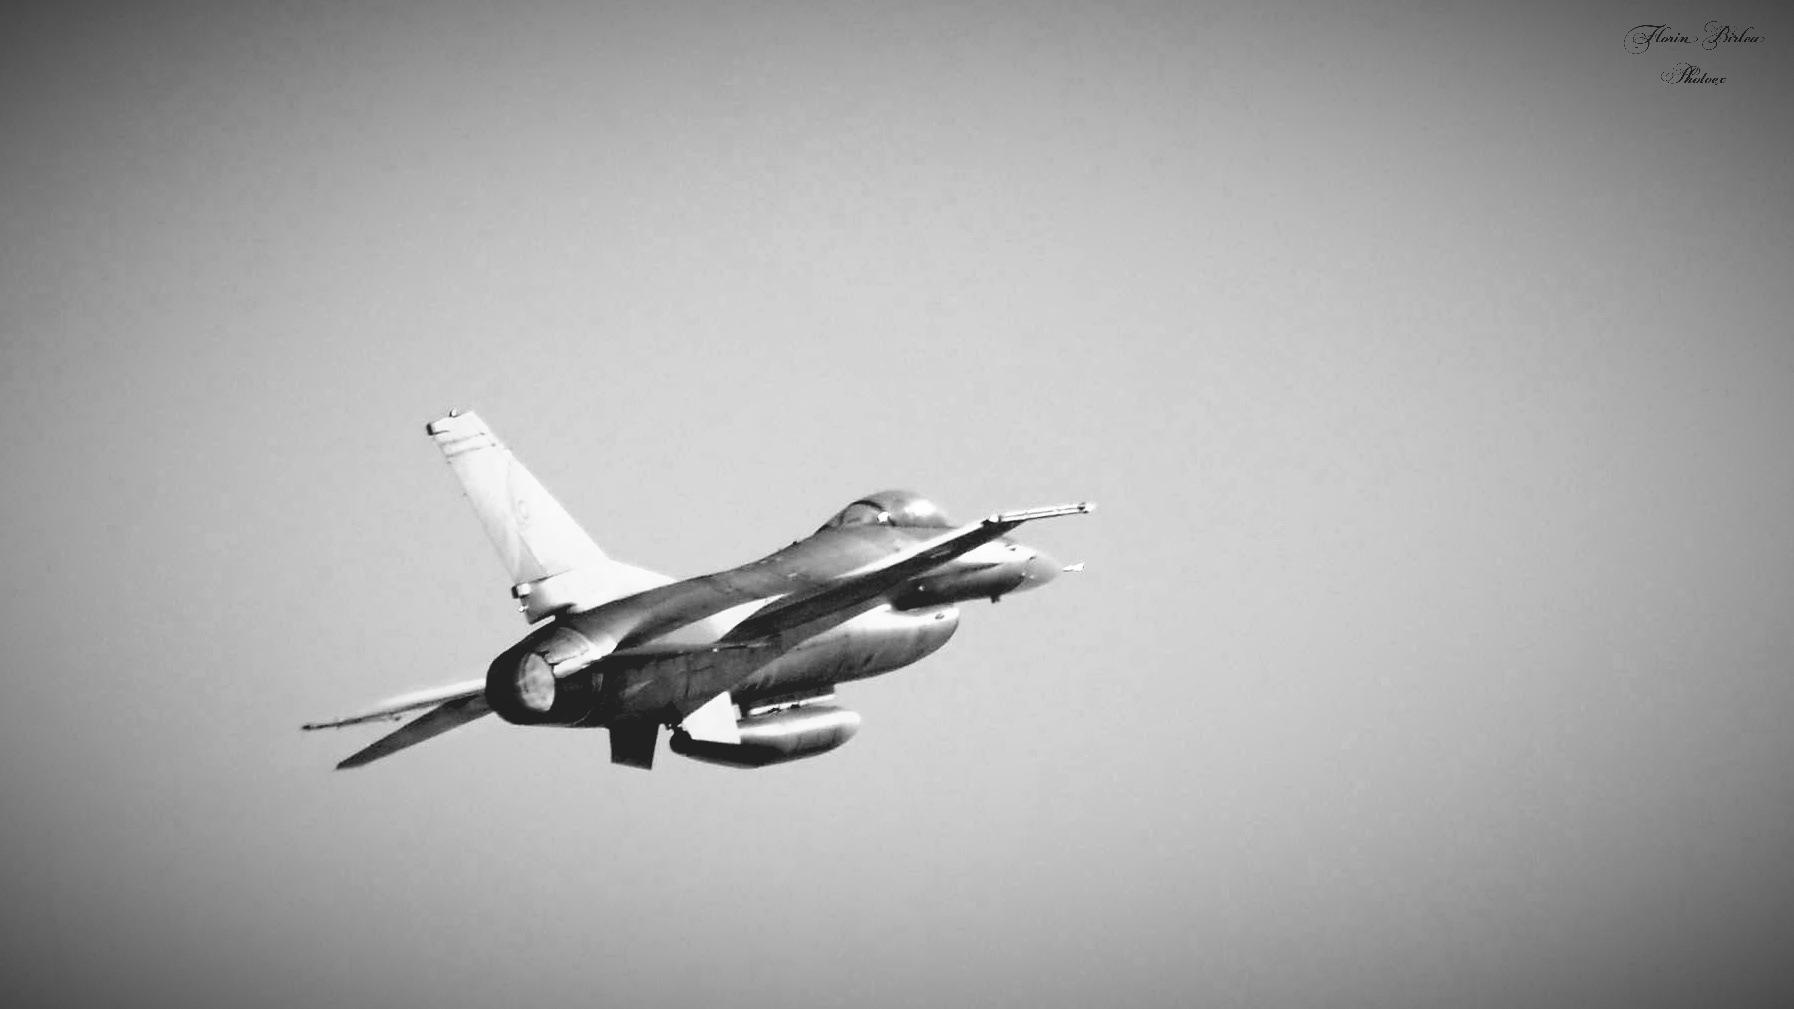 Air police by Florian B